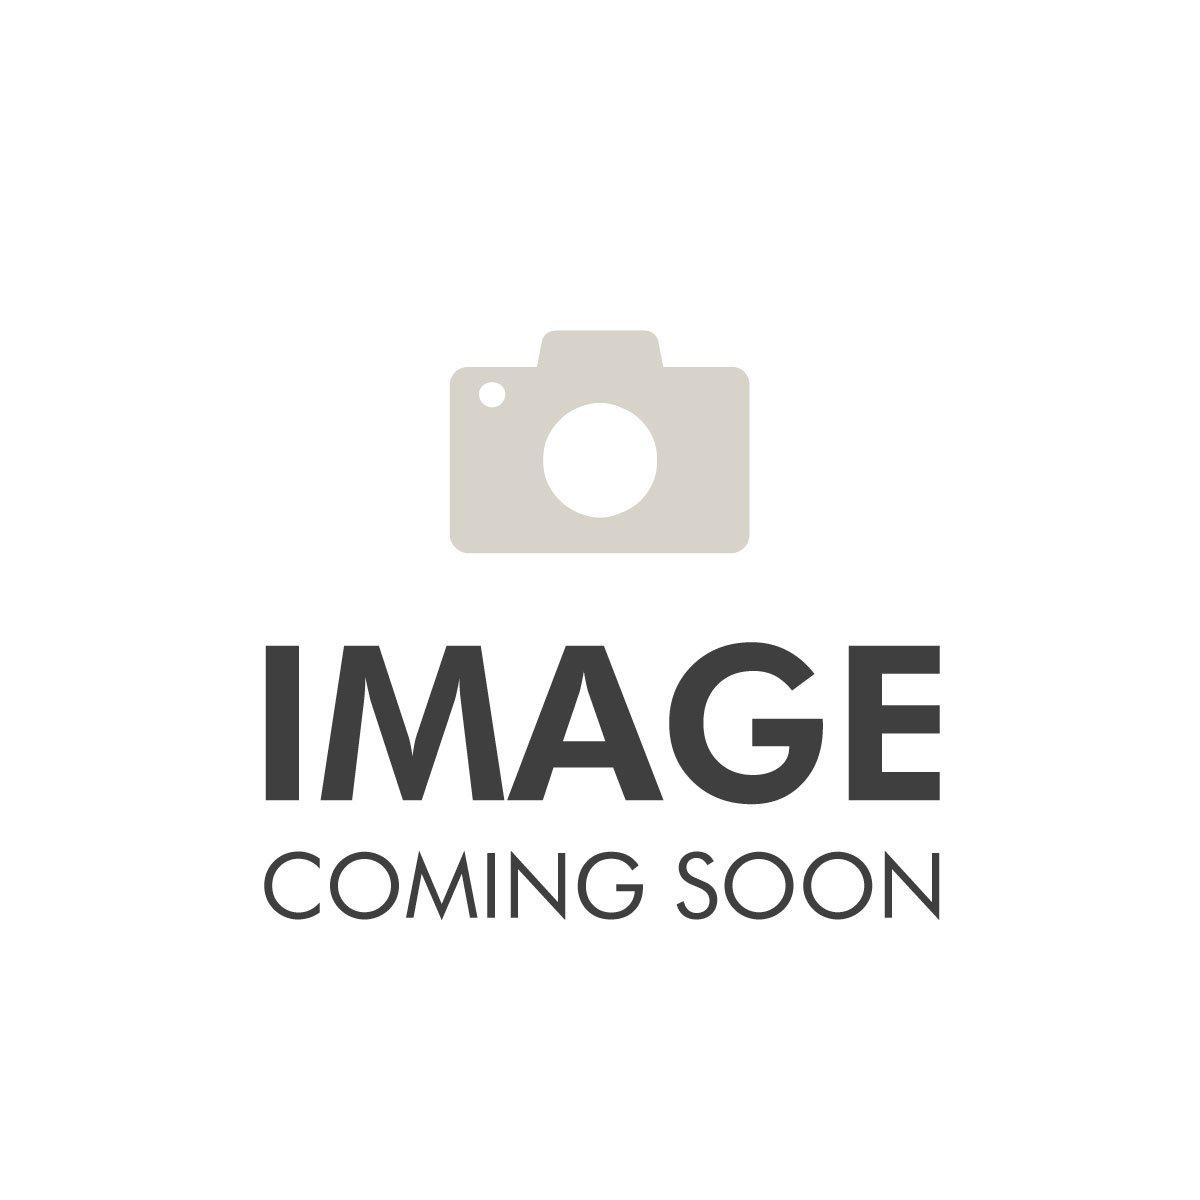 L'Oreal Loreal Super Liner Eye Liner Gel Intenza 001